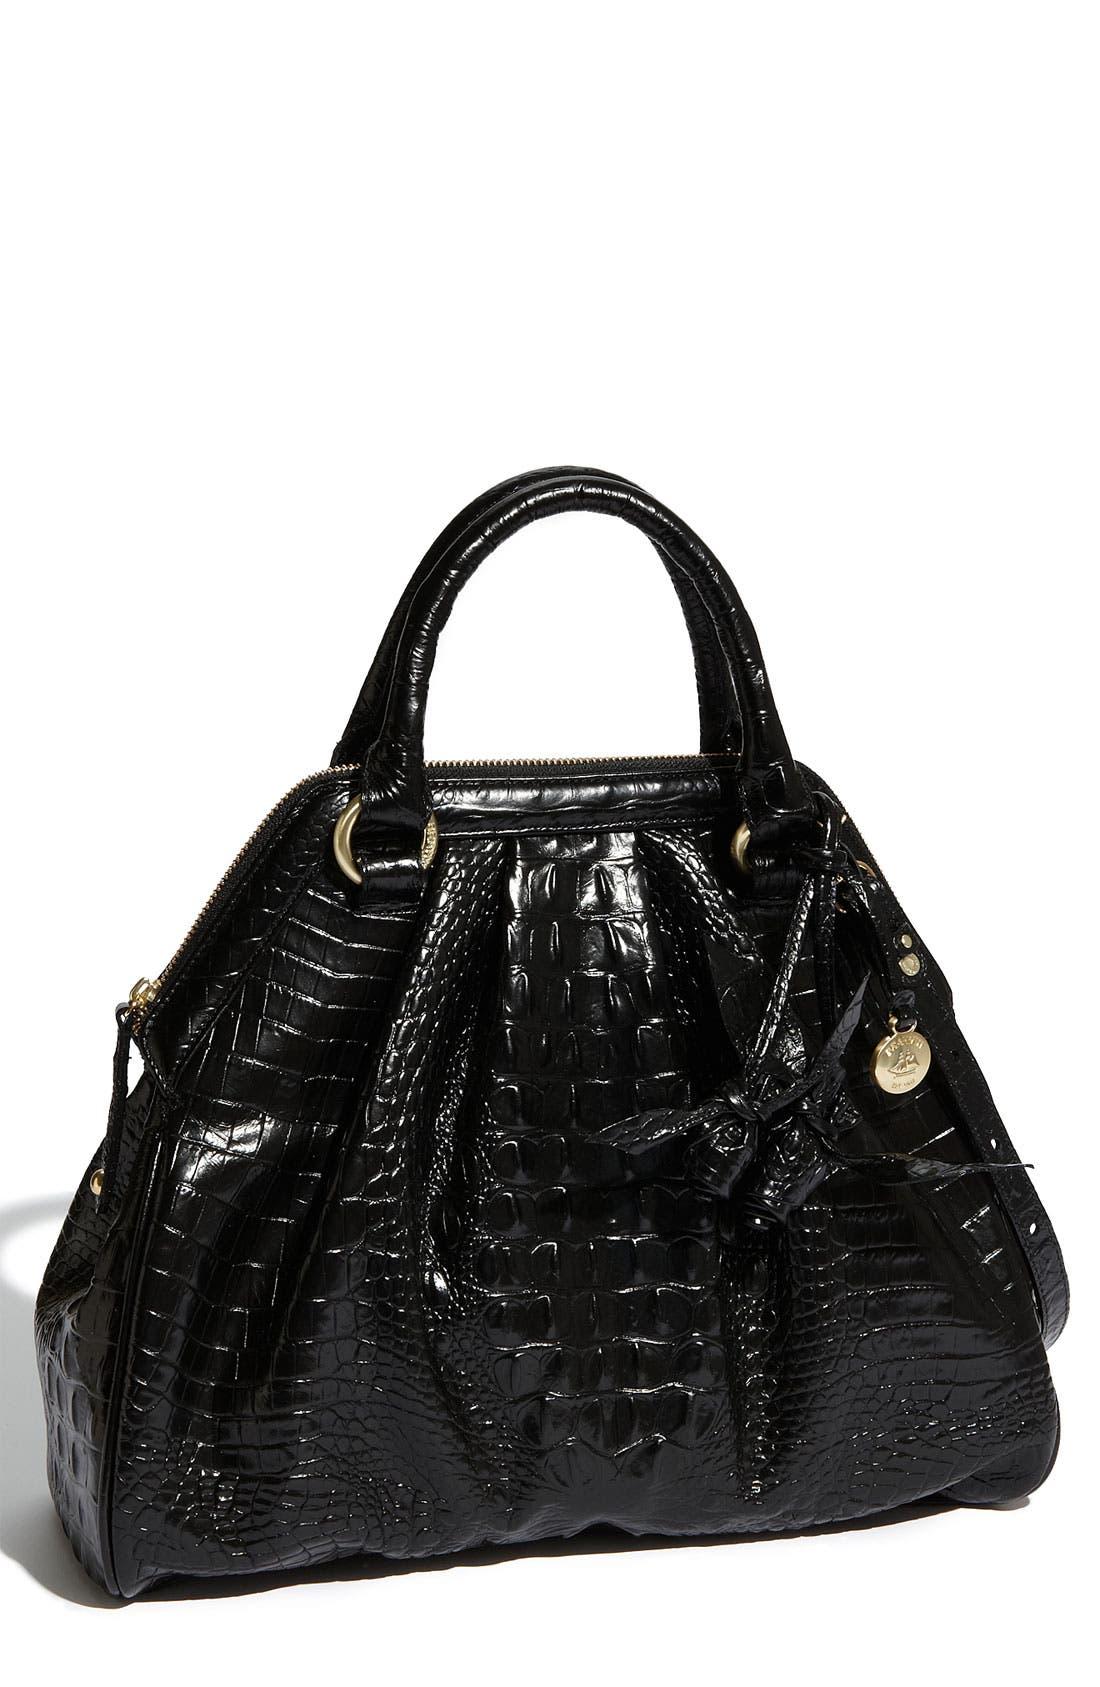 Alternate Image 1 Selected - Brahmin 'Sara Rose' Handbag